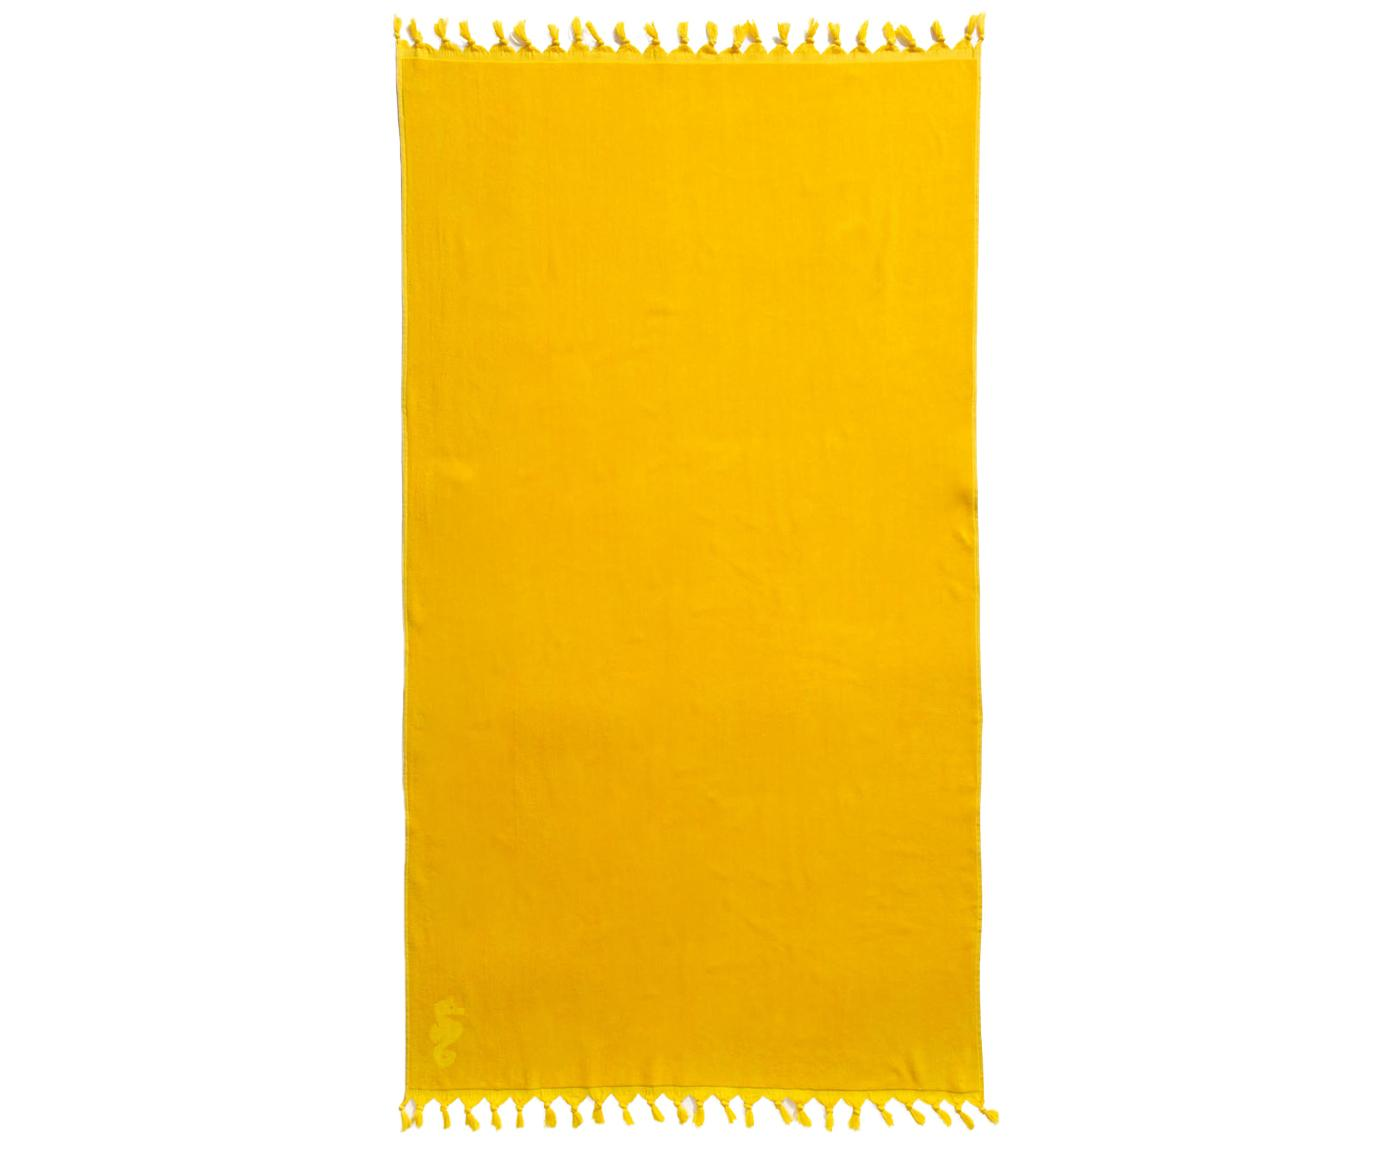 Fouta Lushie, Algodón Gramaje medio, 355g/m², Amarillo sol, An 100 x L 180 cm